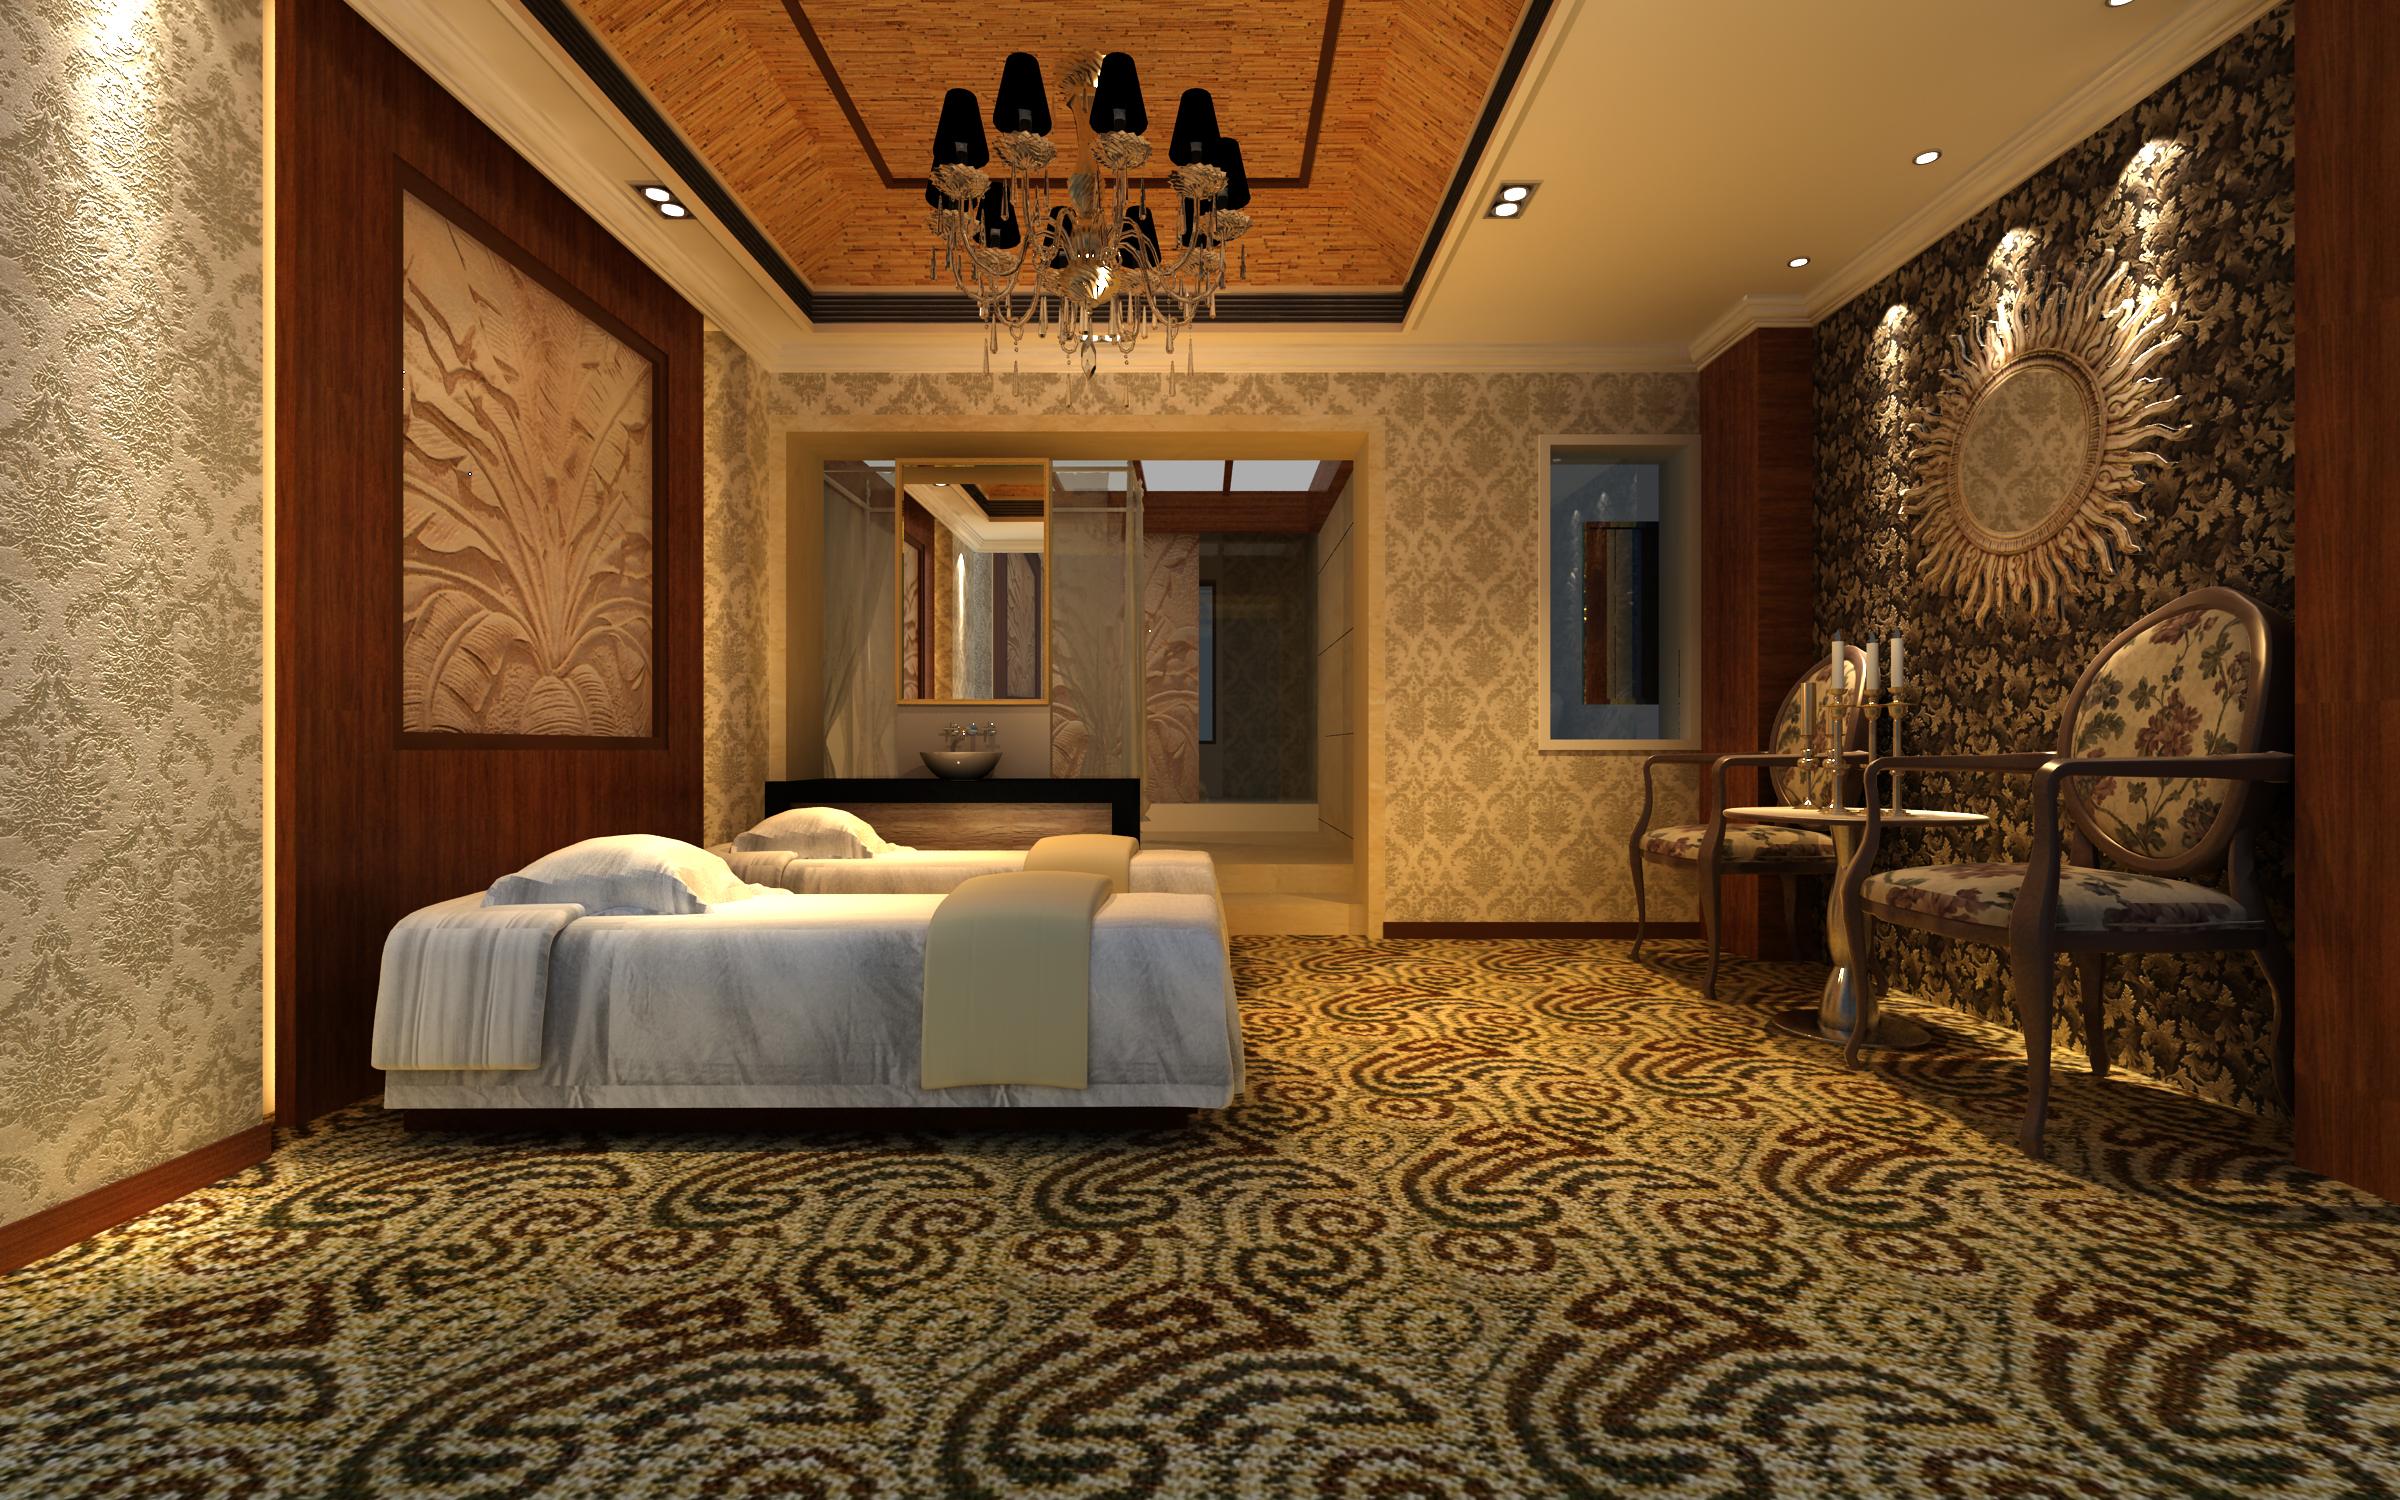 spa istaba 026 3d modelis max 137969